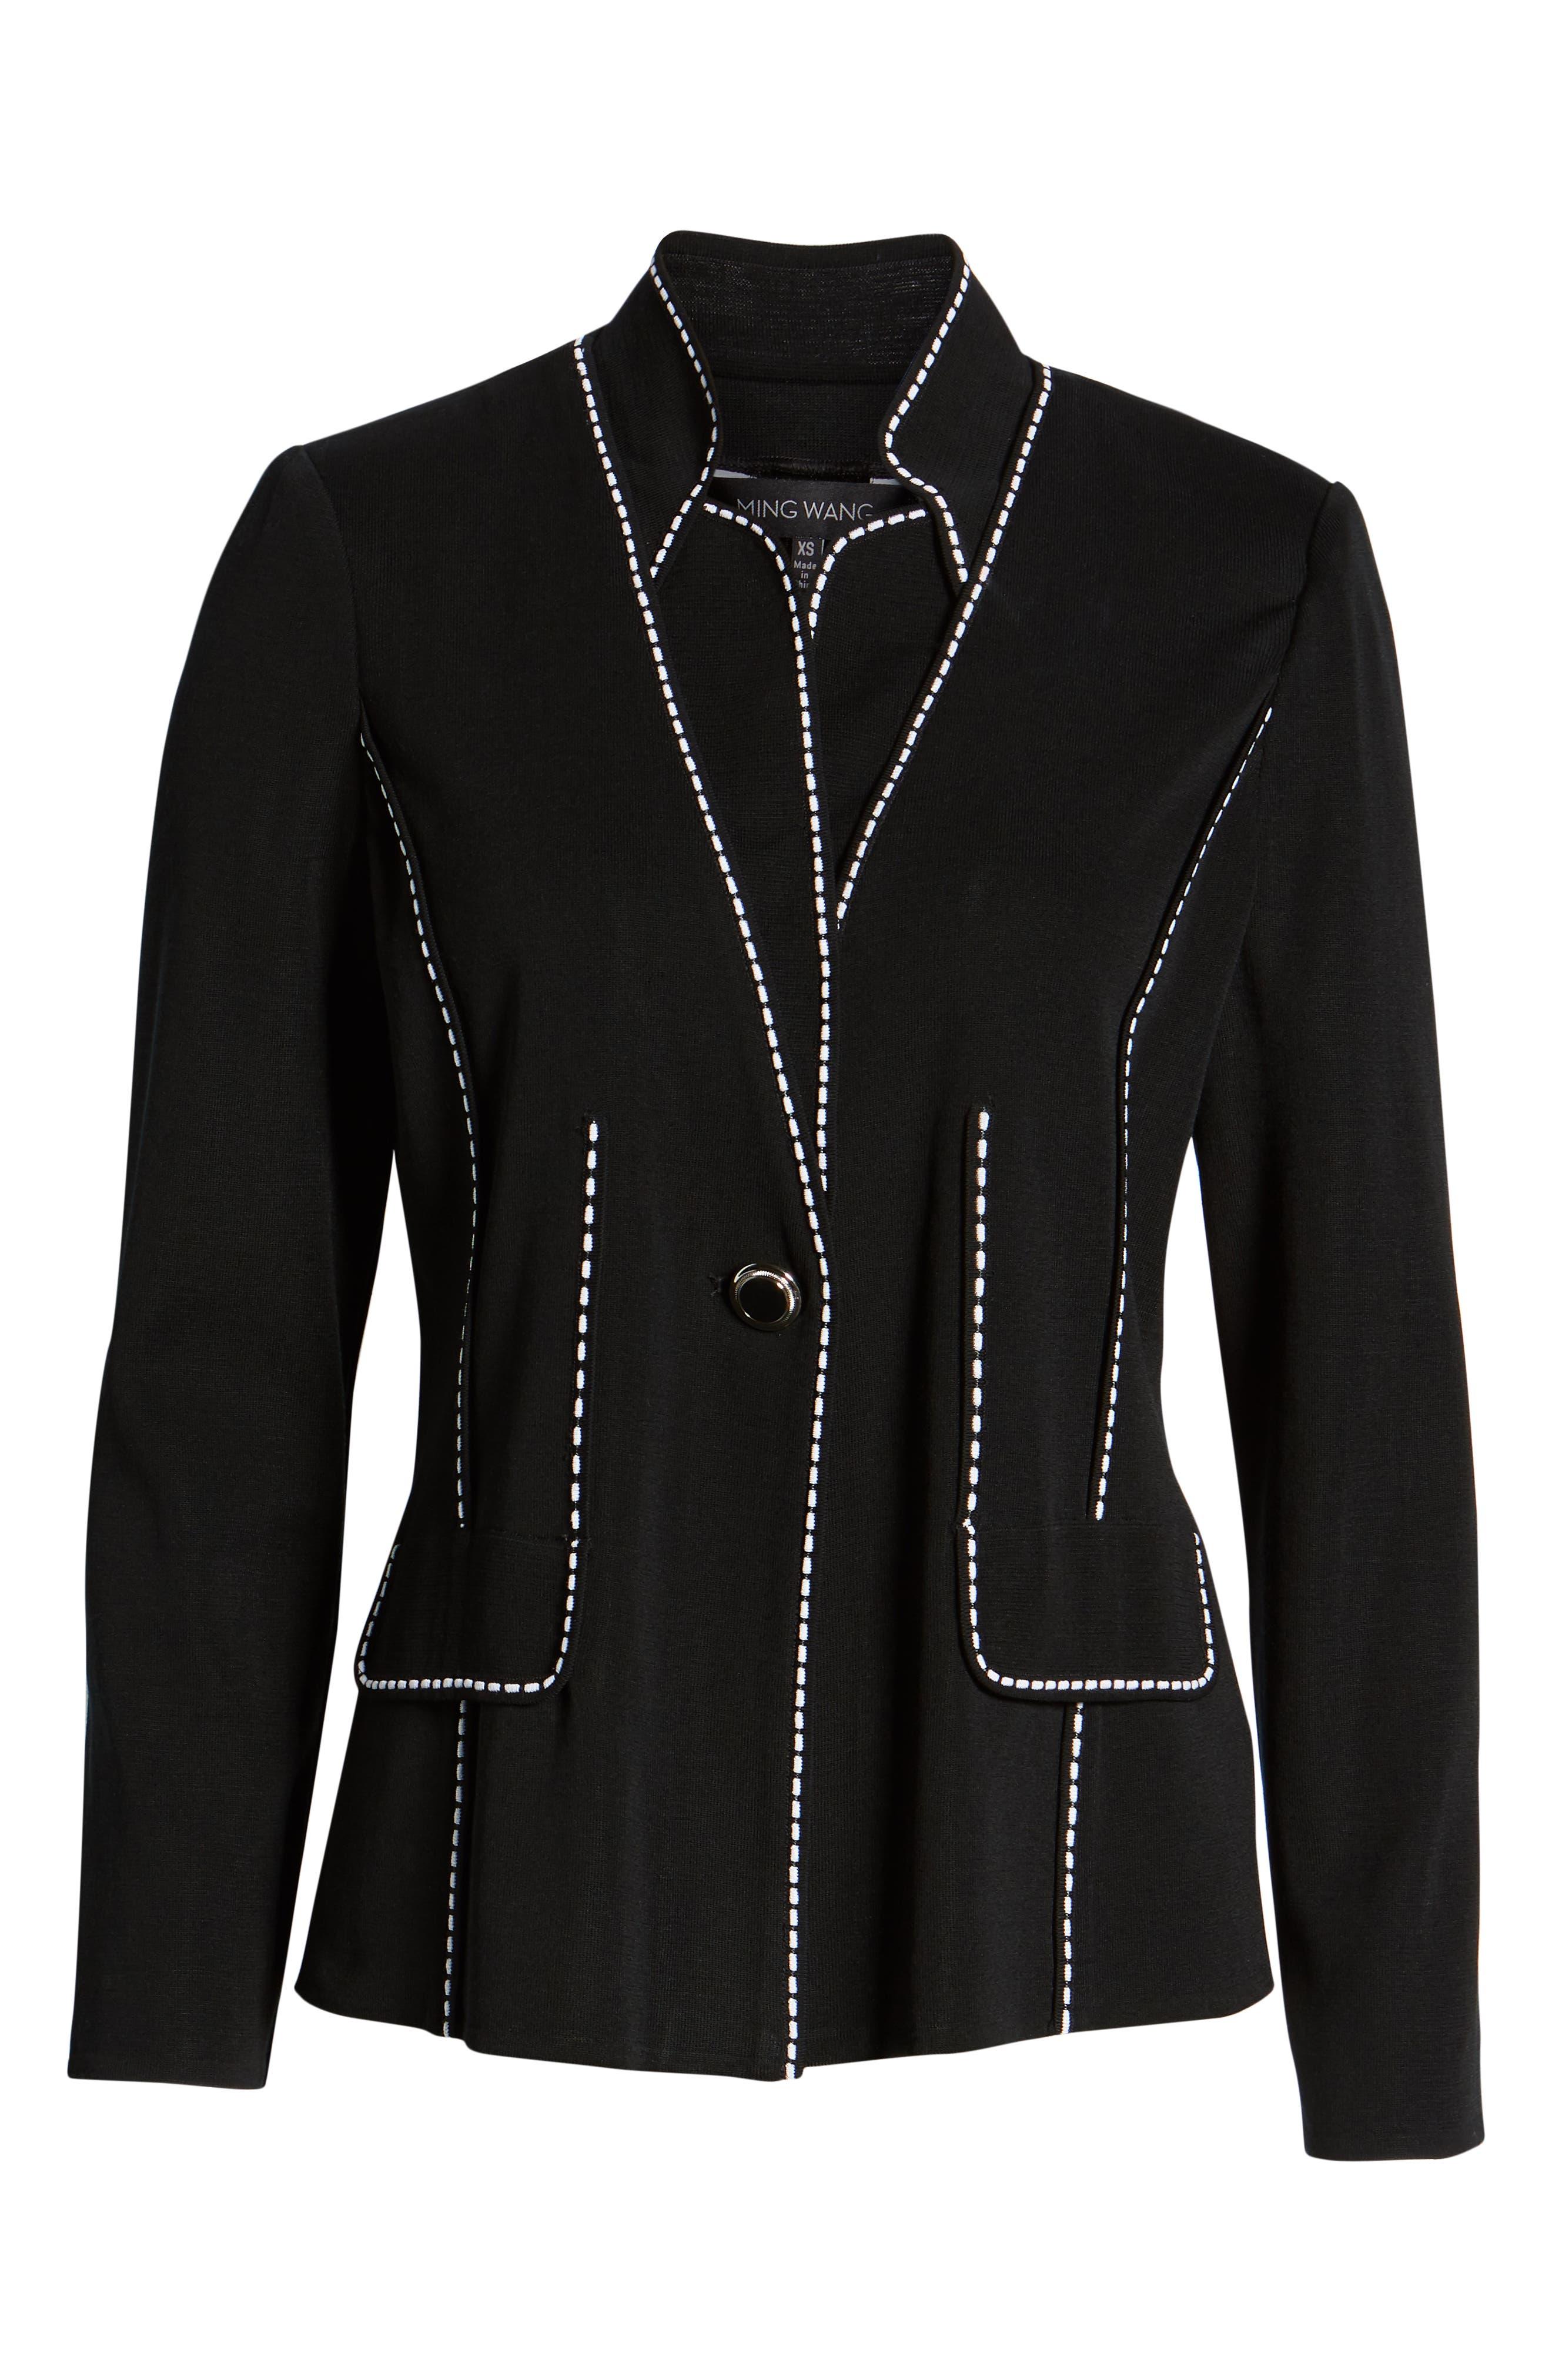 Contrast Jacquard Sweater Jacket,                             Alternate thumbnail 6, color,                             BLACK/ WHITE